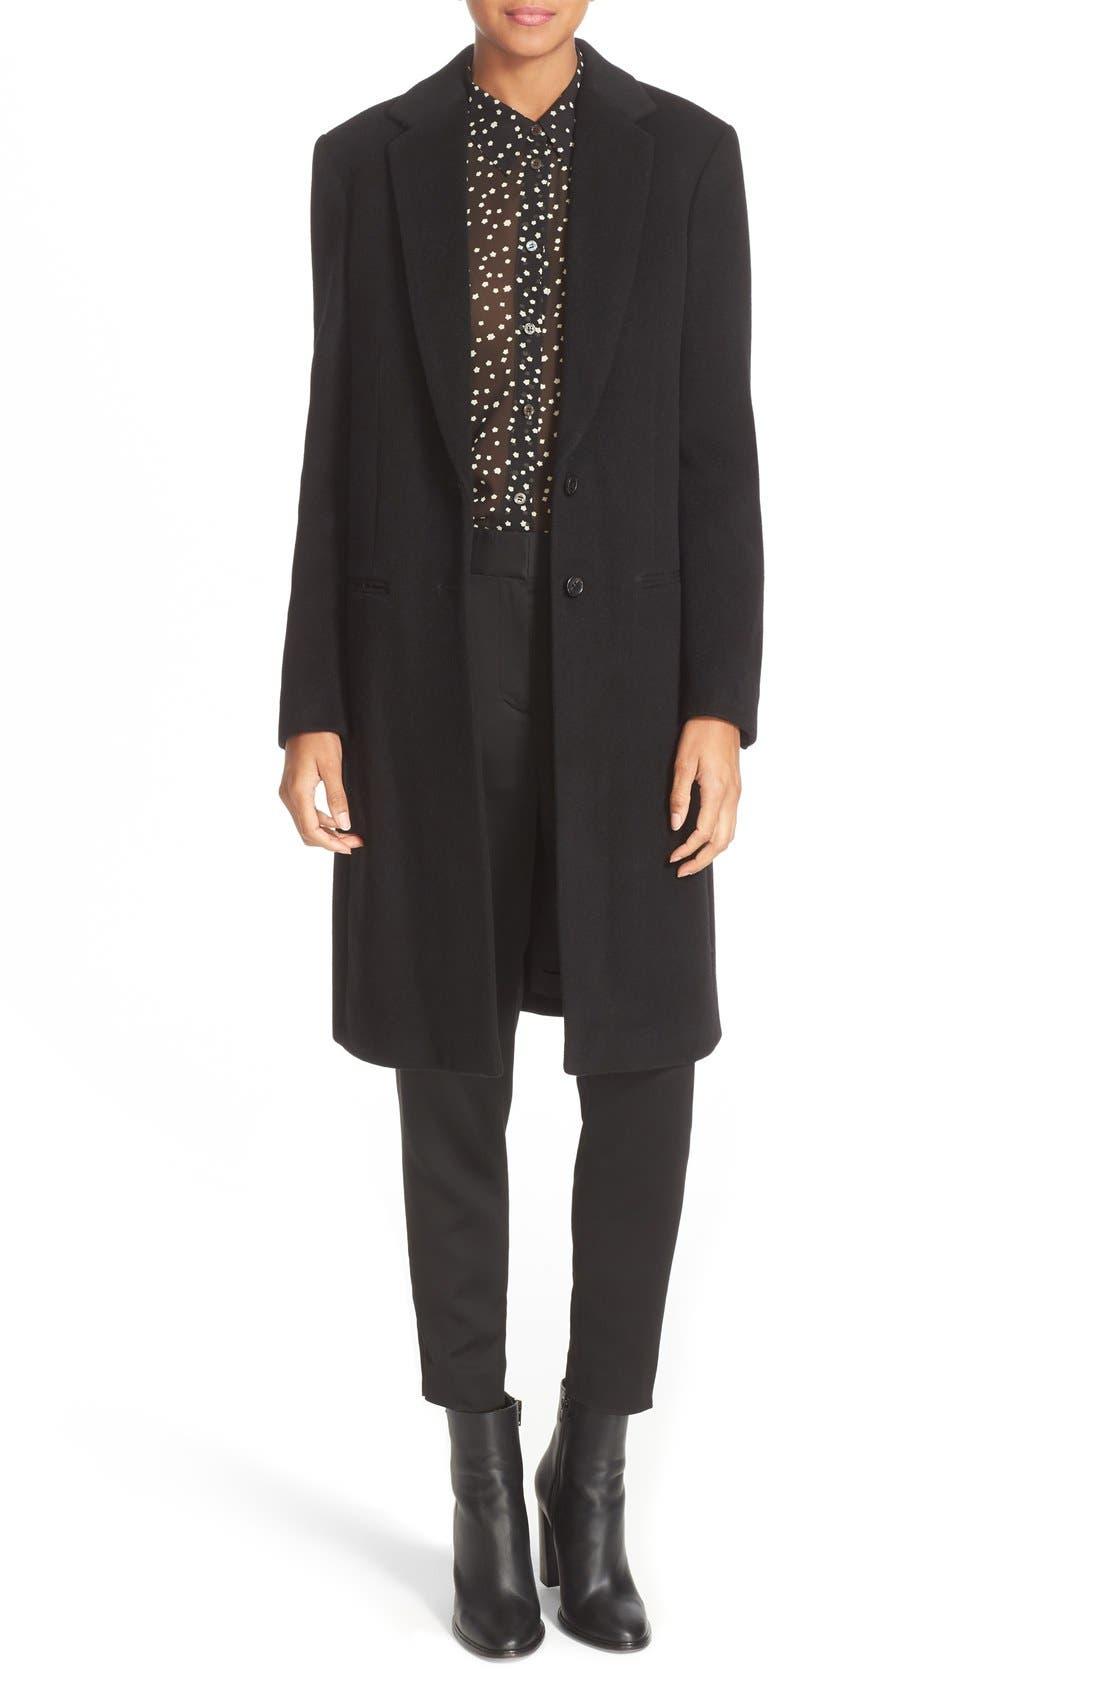 JOSEPH Mart Wool & Cashmere Coat, Main, color, 001